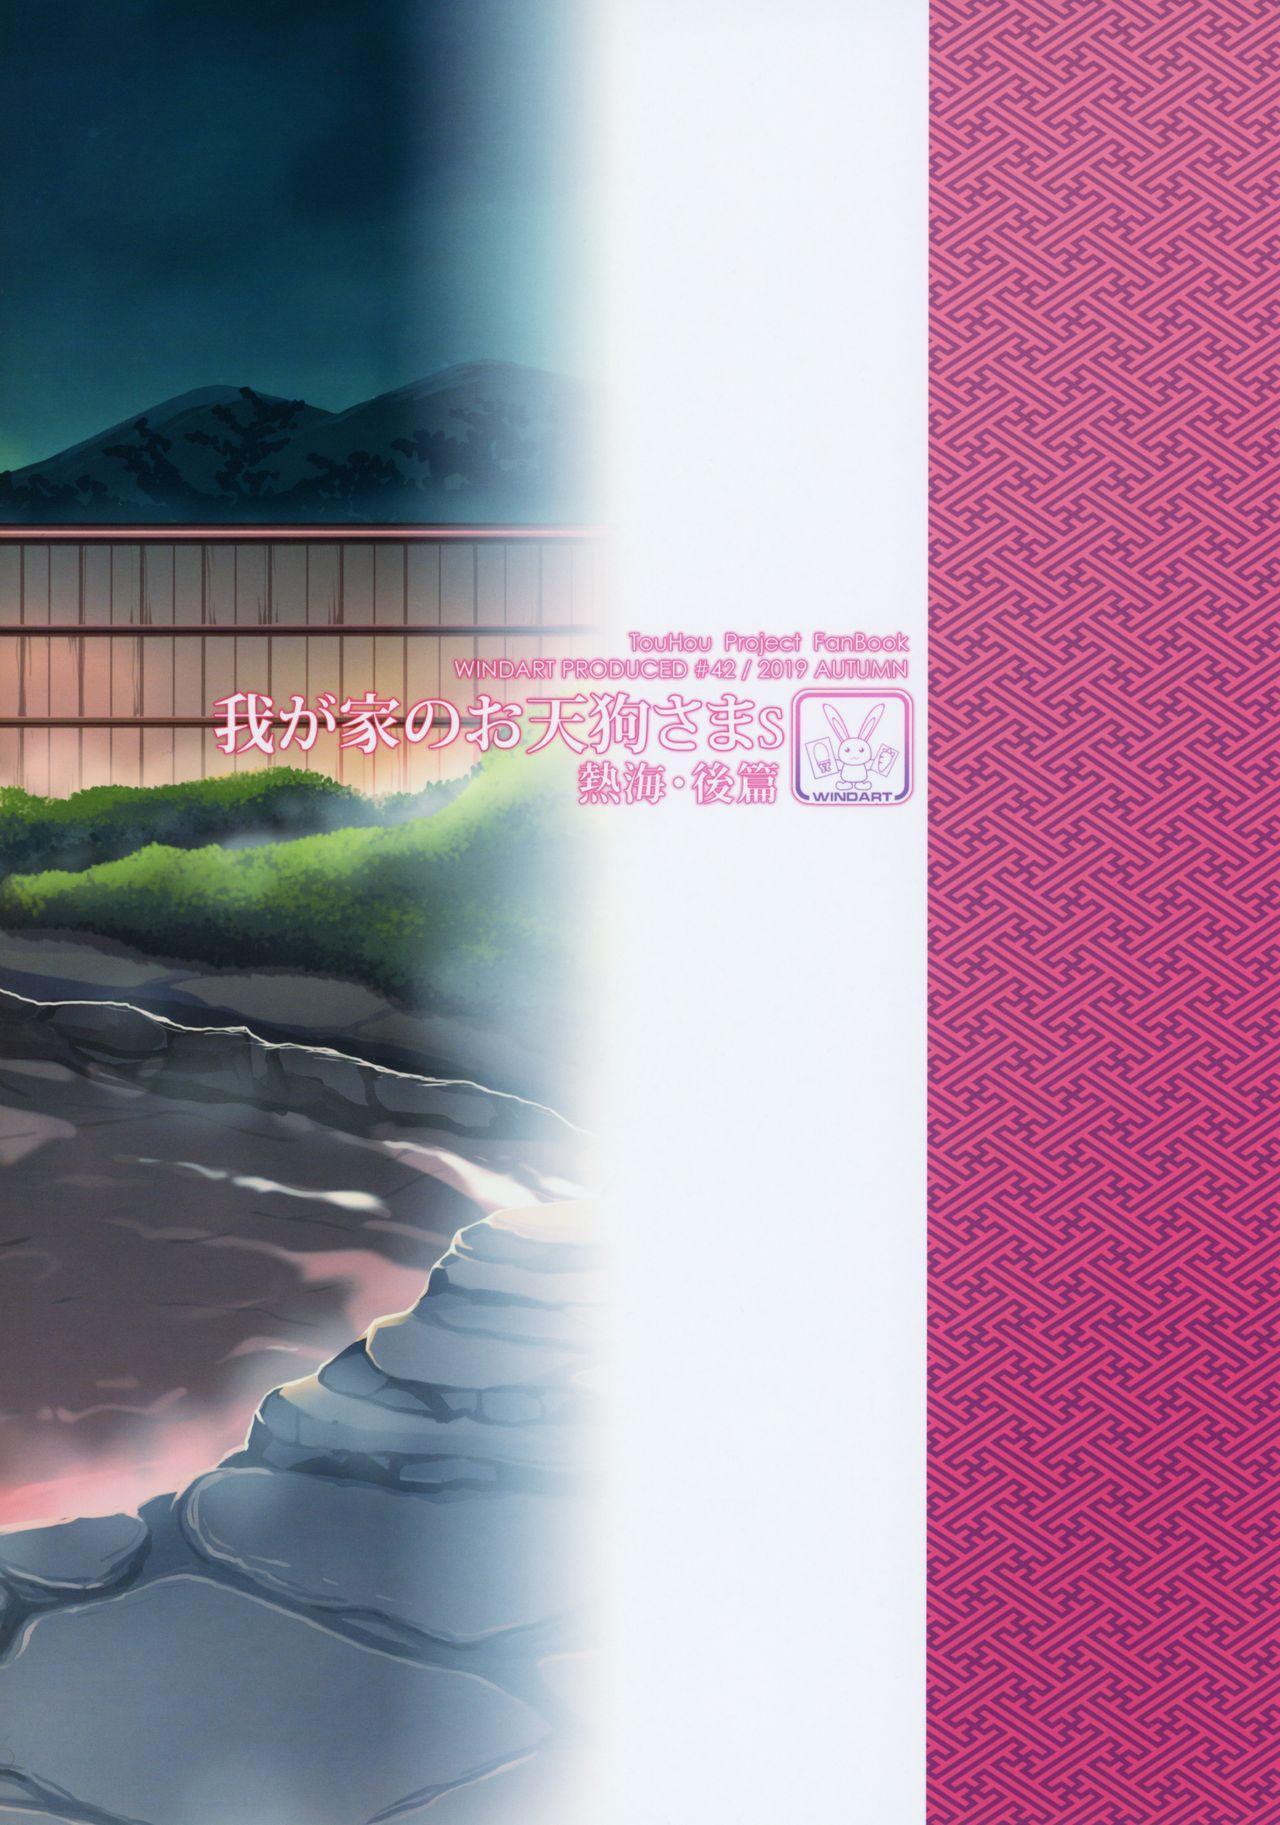 (Shuuki Reitaisai 6) [WindArTeam (WindArt)] Wagaya no Otengu-sama S -Atami Kouhen- (Touhou Project) [Chinese] [如果沒有更多小紫紫 我可能無法繼續漢化組] 25